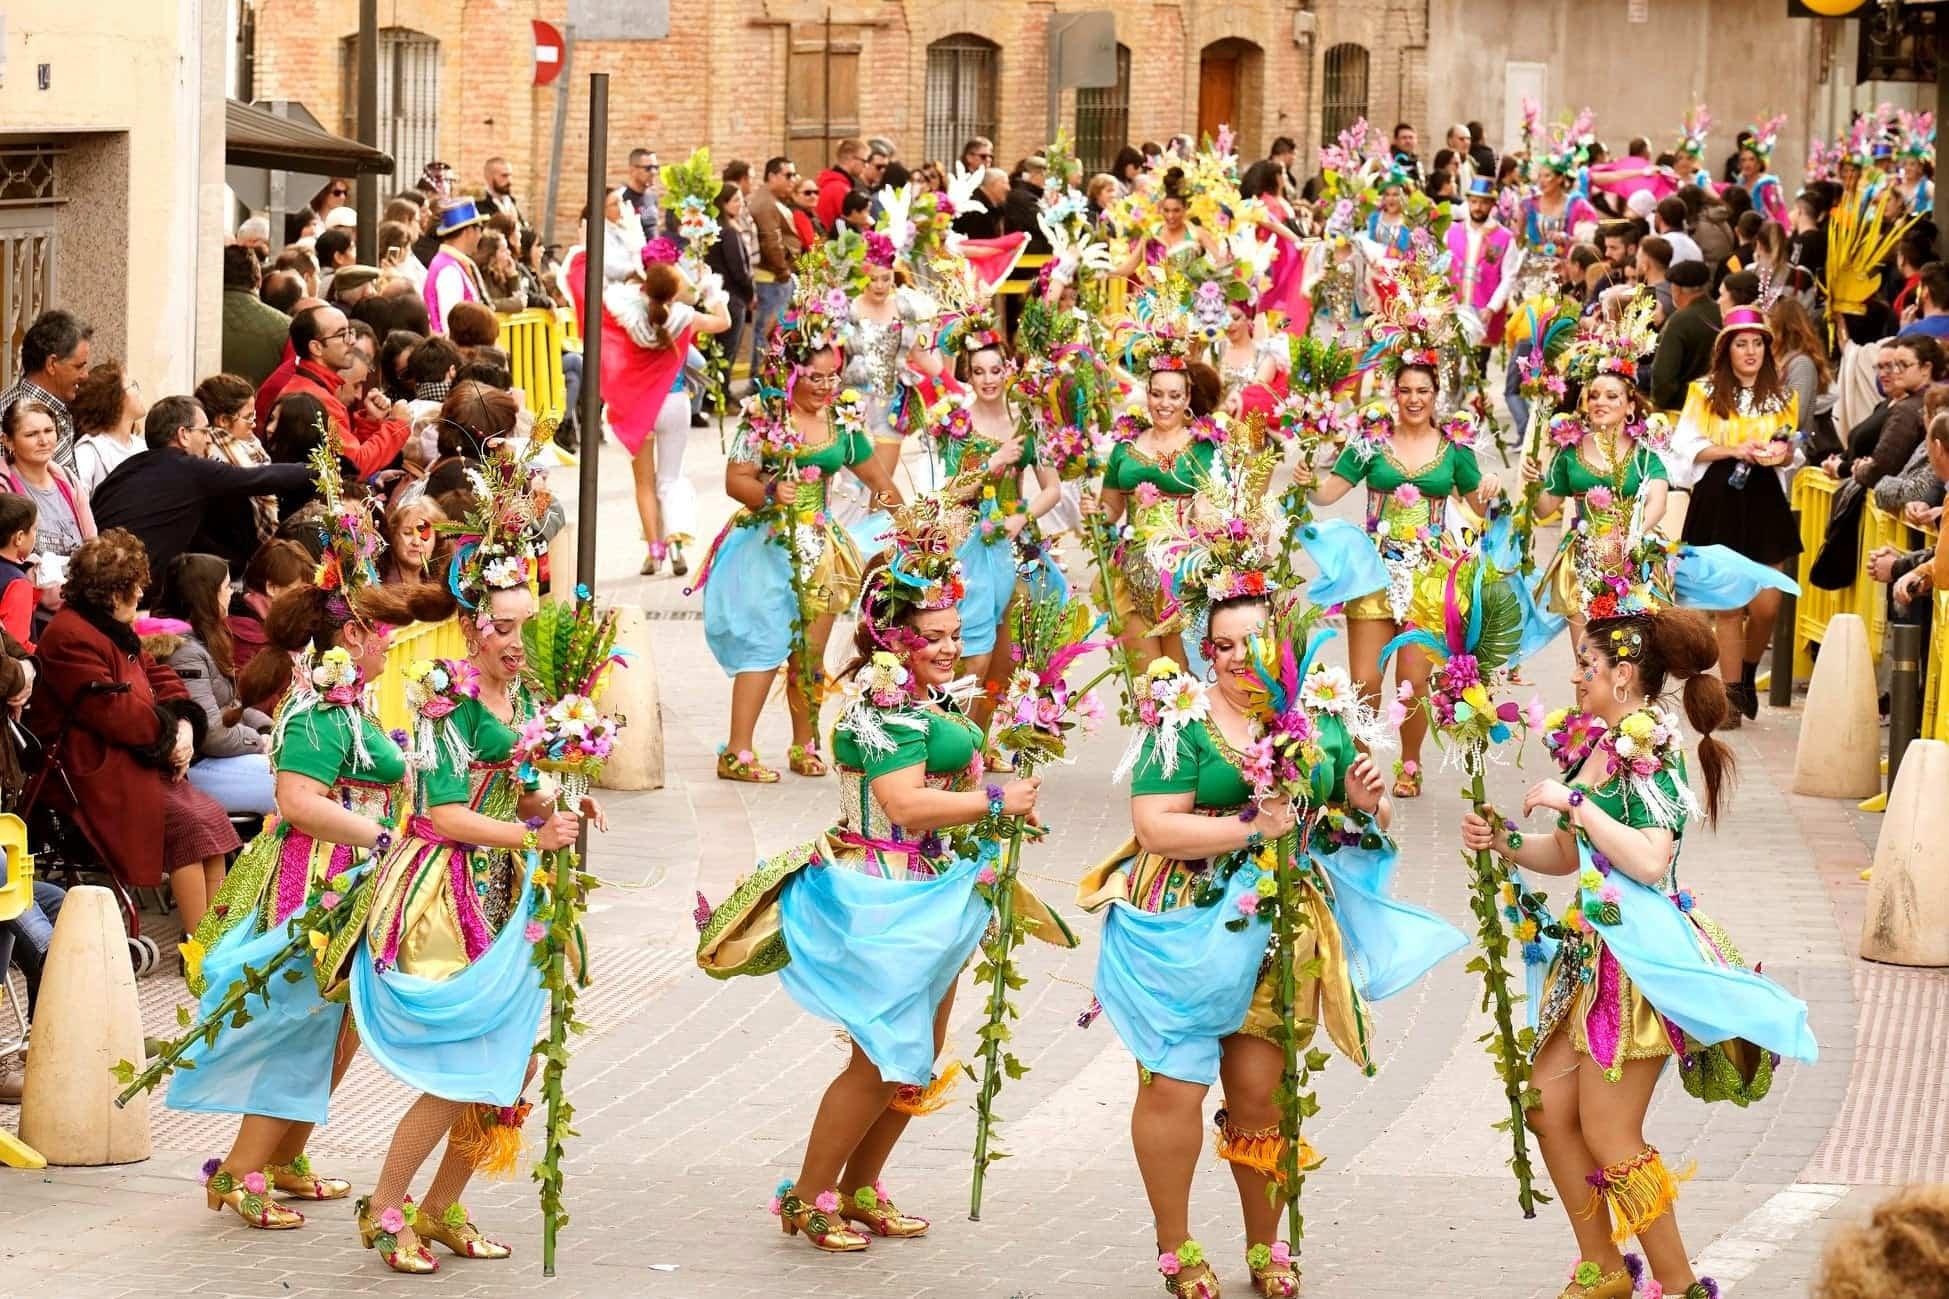 Carnaval de herencia 2020 ofertorio 6 - Selección de fotografías del Ofertorio del Carnaval de Herencia